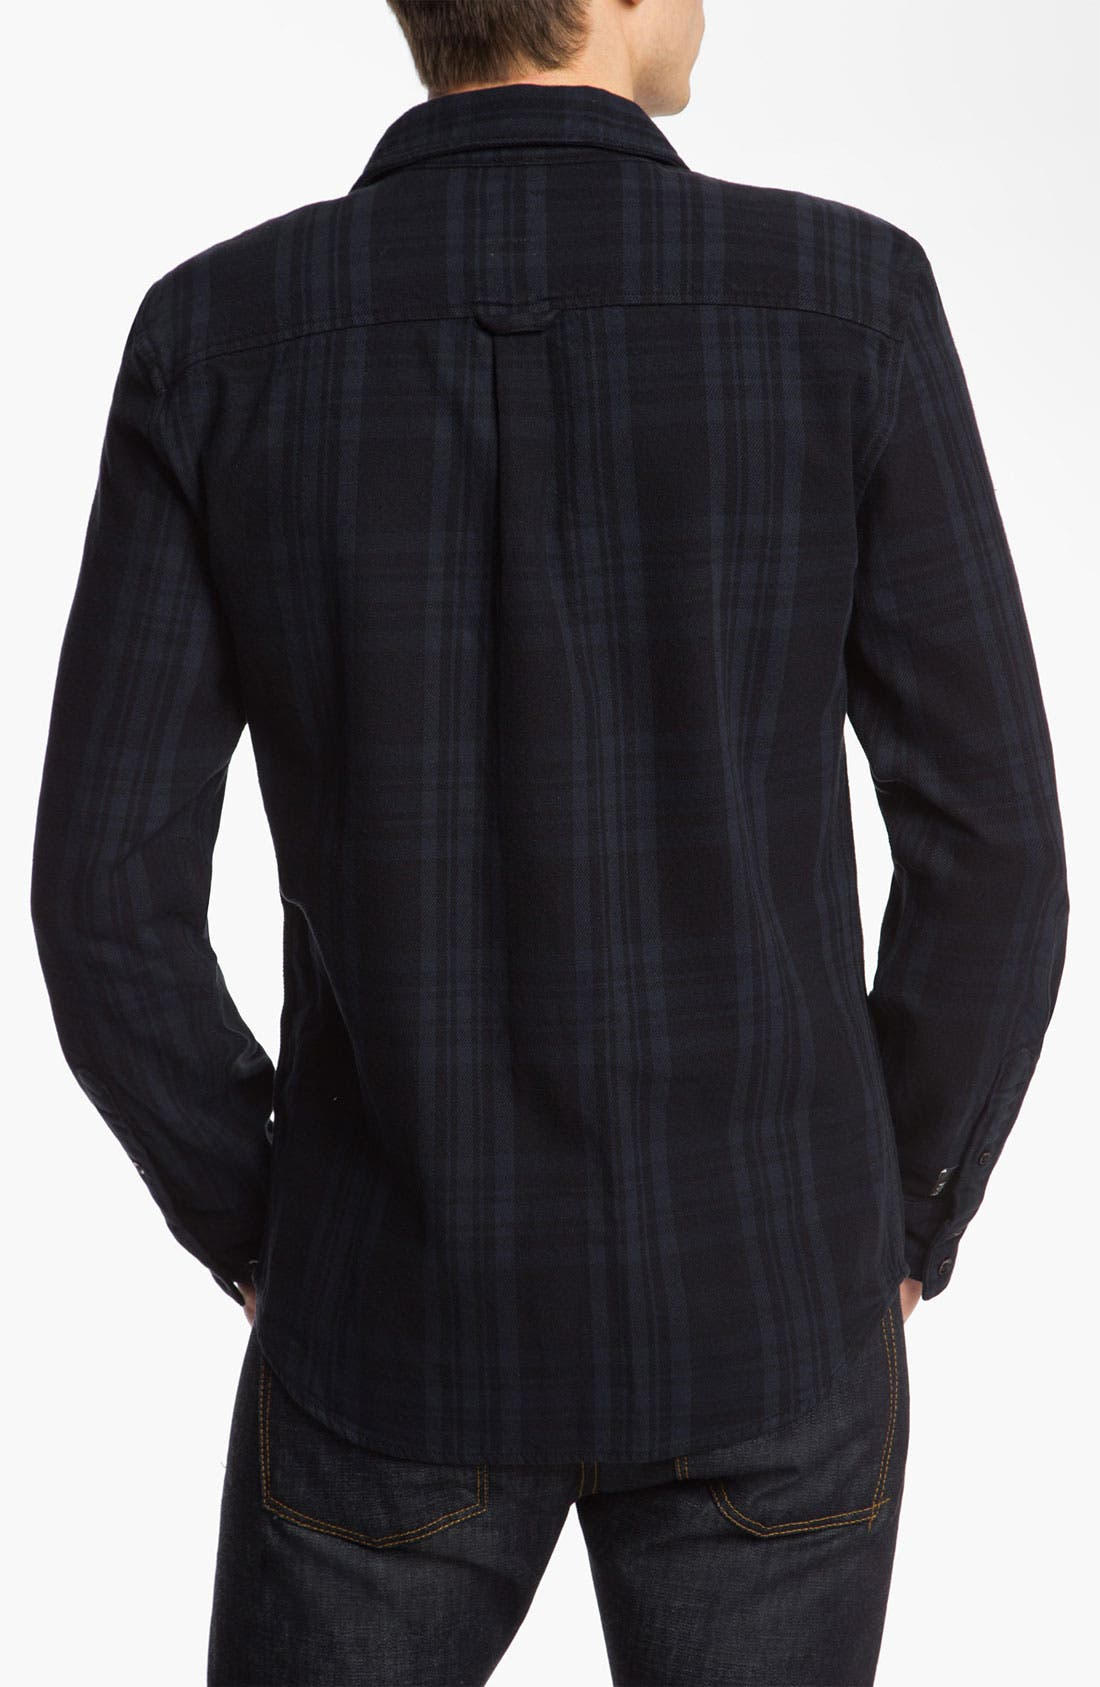 Alternate Image 2  - VSTR 'Jackson' Plaid Woven Shirt